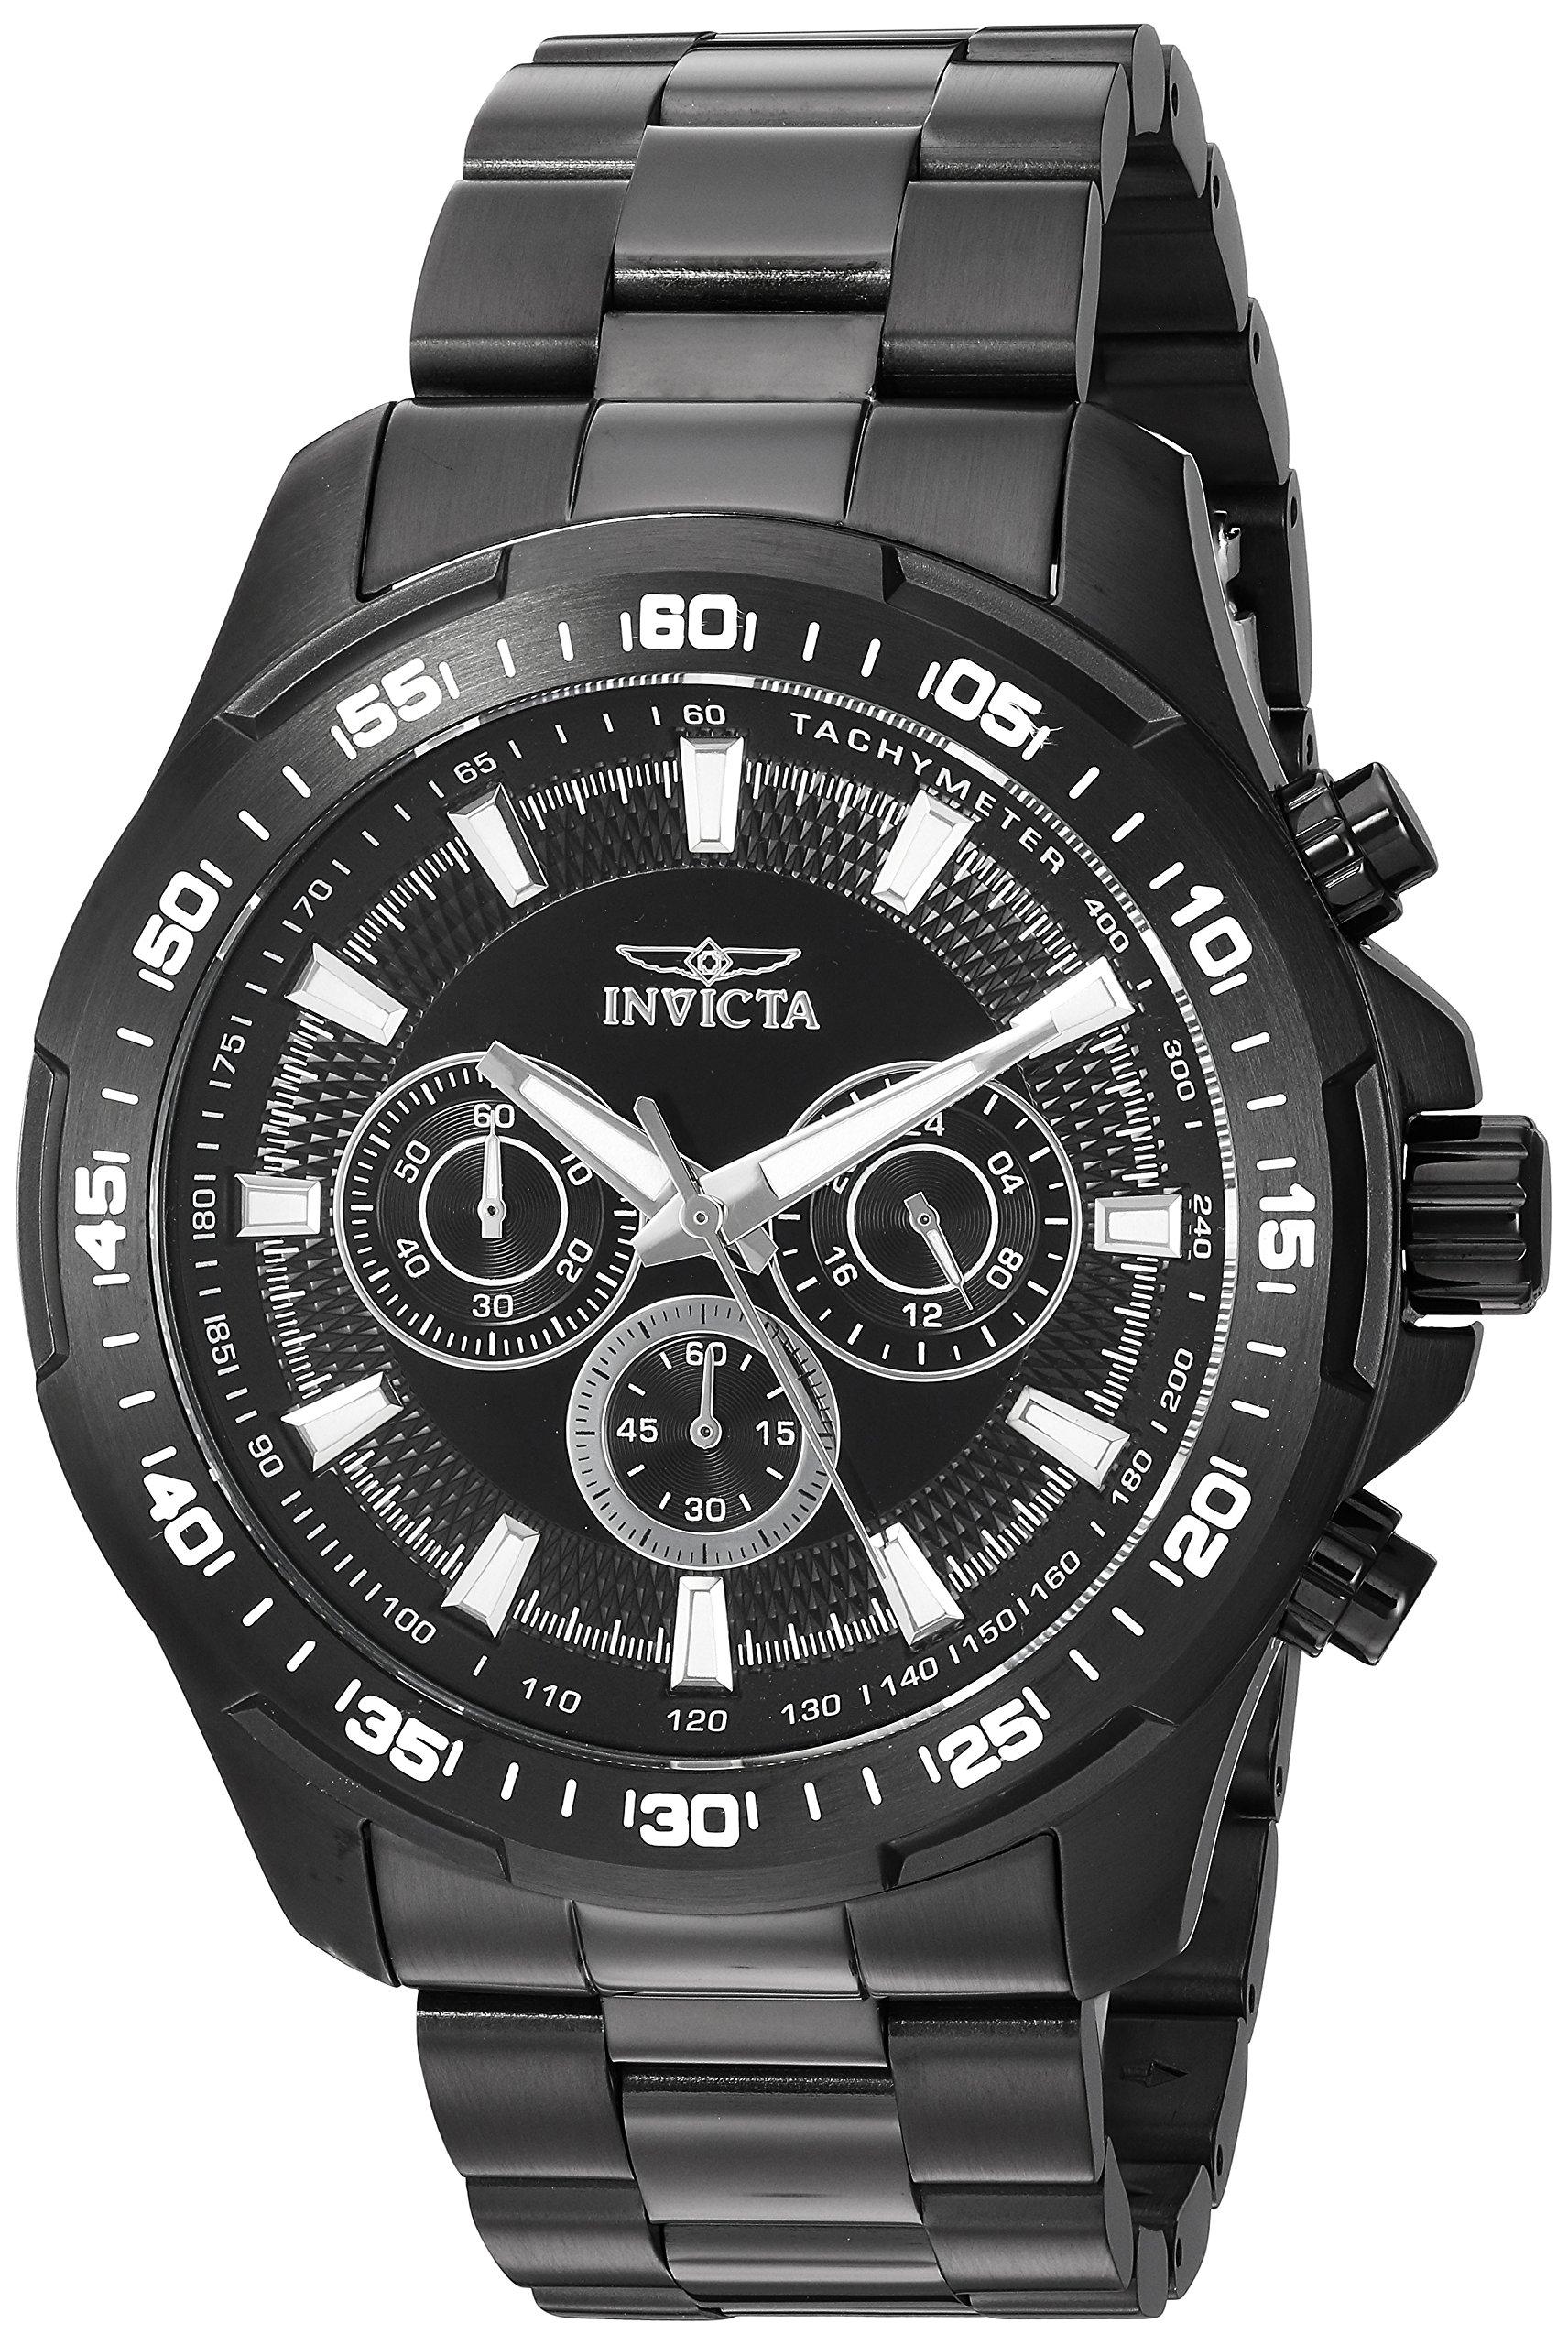 ویکالا · خرید  اصل اورجینال · خرید از آمازون · Invicta Men's 'Speedway' Quartz Stainless Steel Casual Watch, Color:Black (Model: 22785) wekala · ویکالا